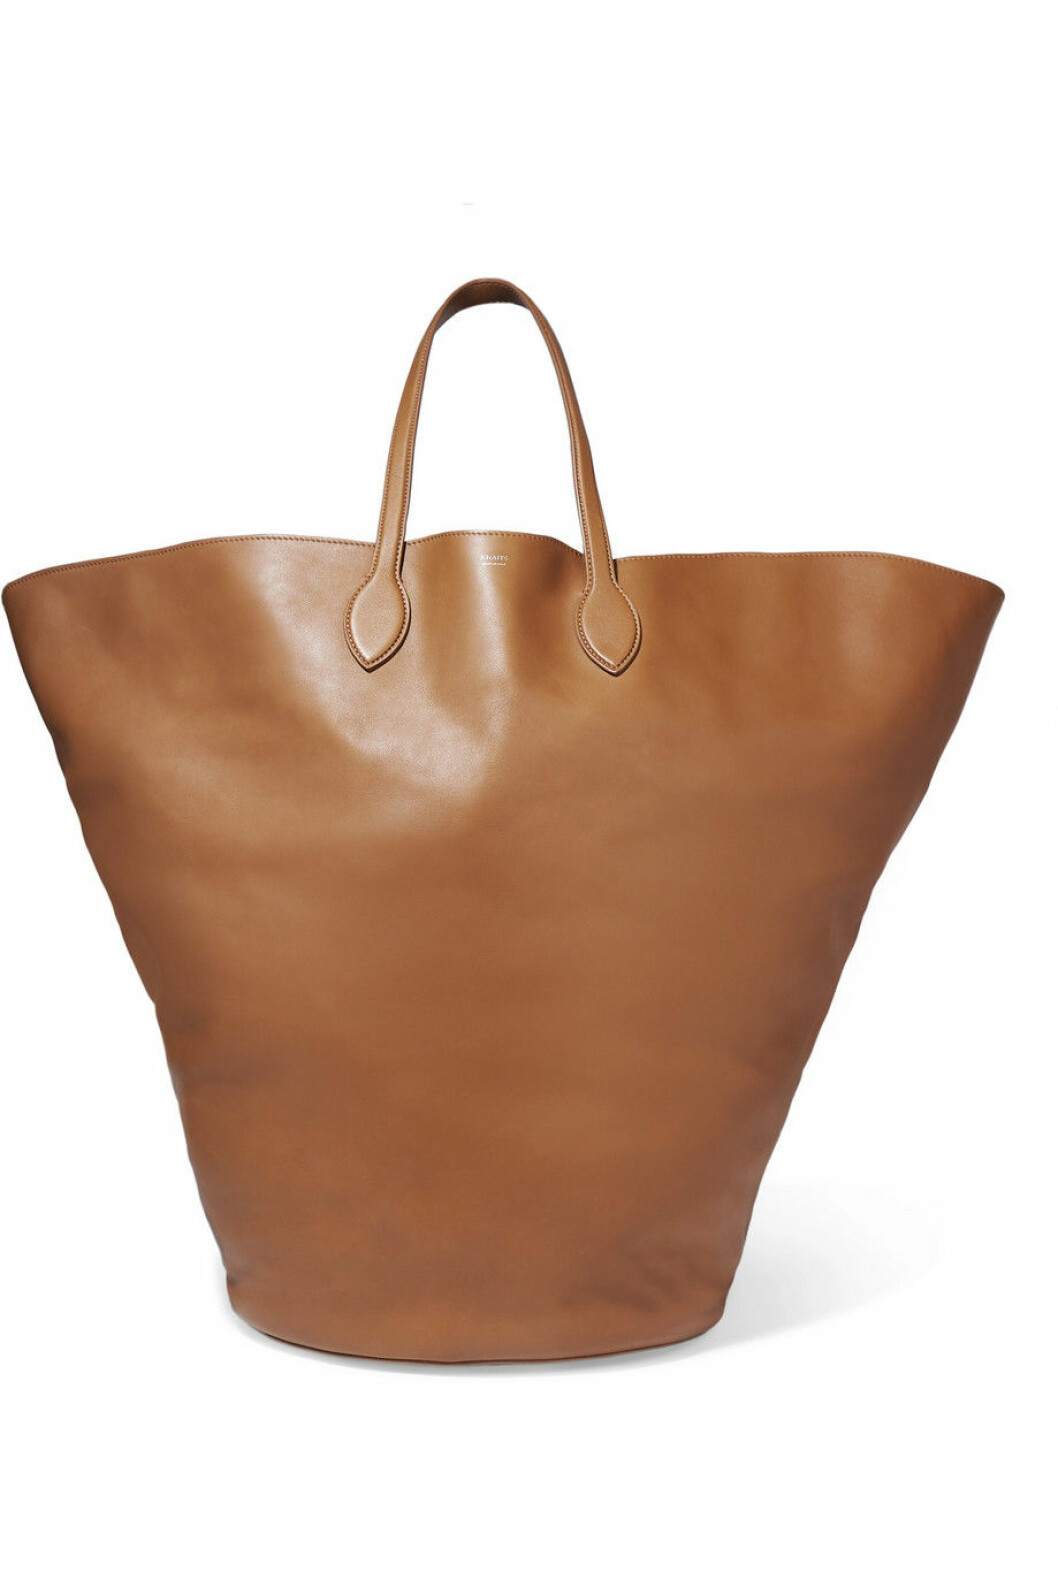 Stor brunbeige väska från Khaite via Net-a-porter.